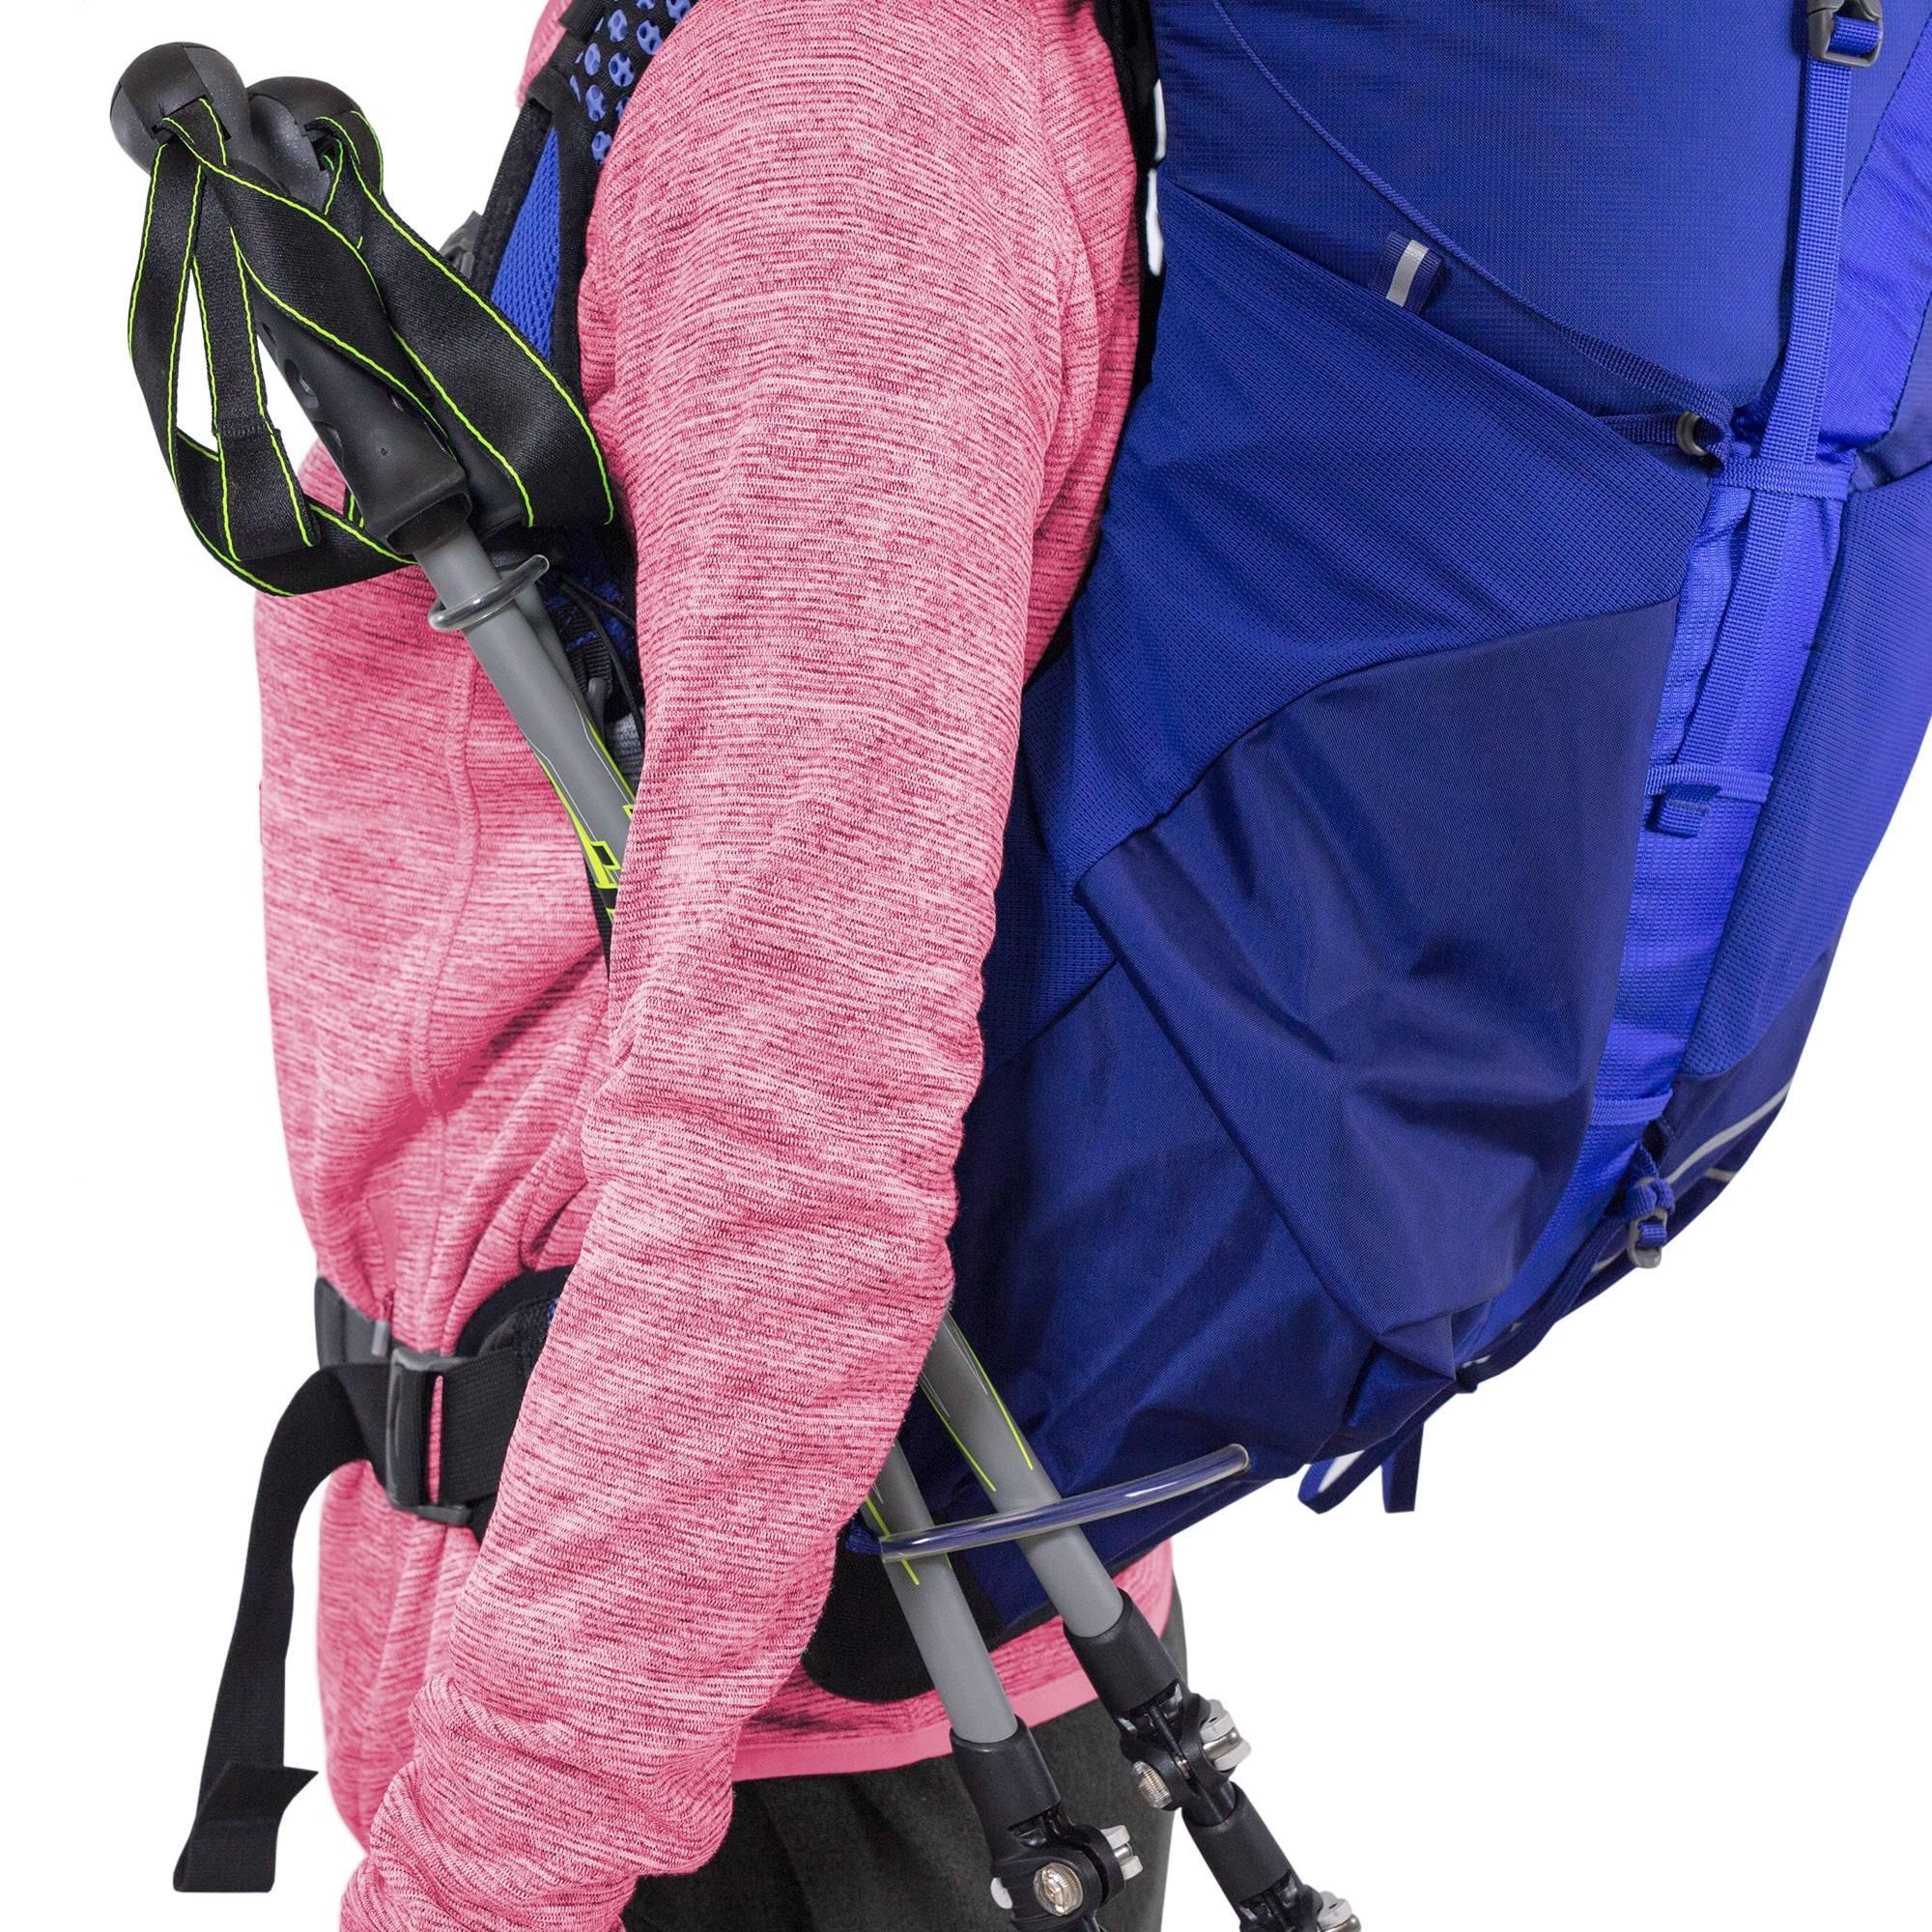 Osprey-Eja-Stow-on-the-Go-trekking-pole-attachment